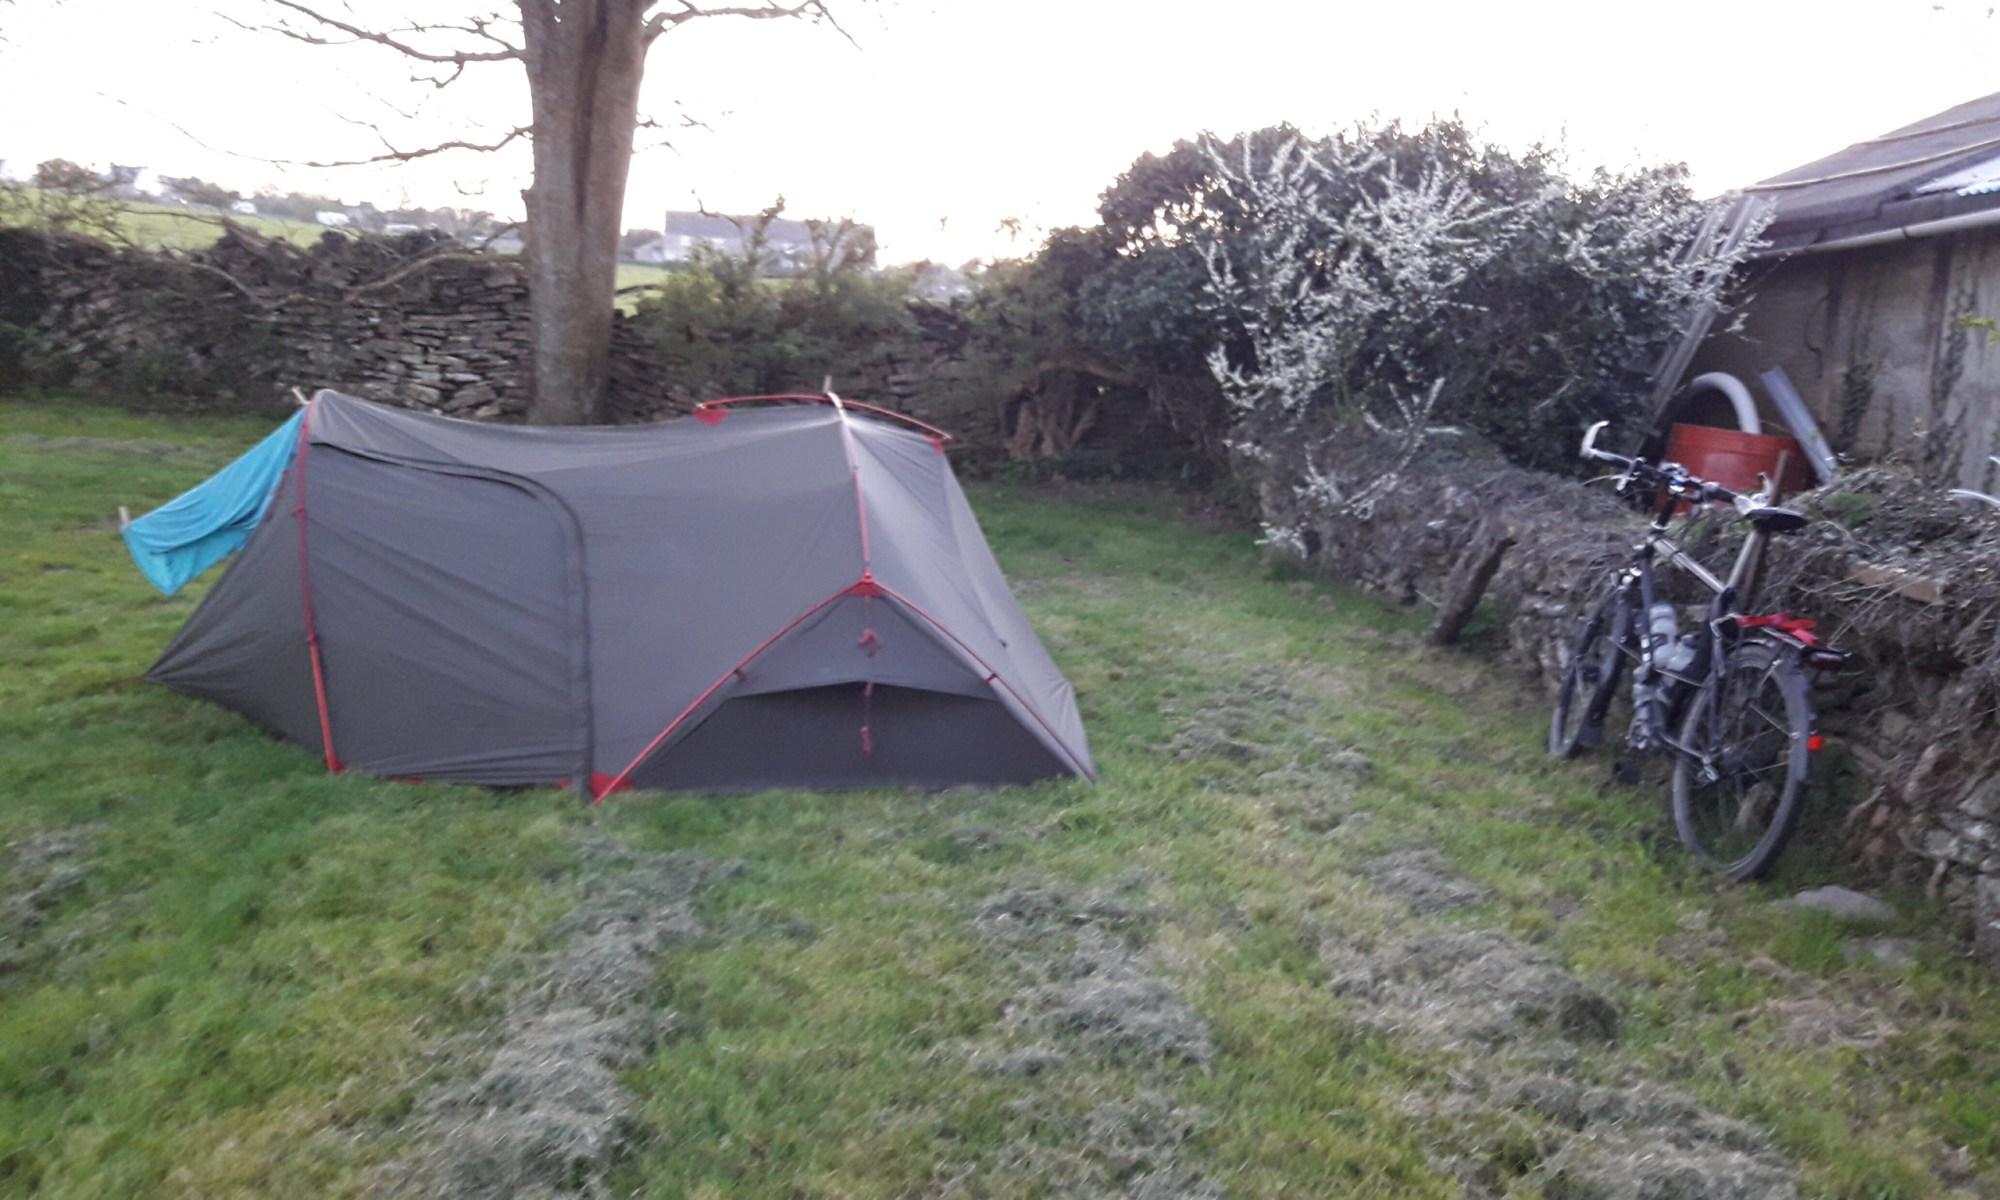 Tent in a field